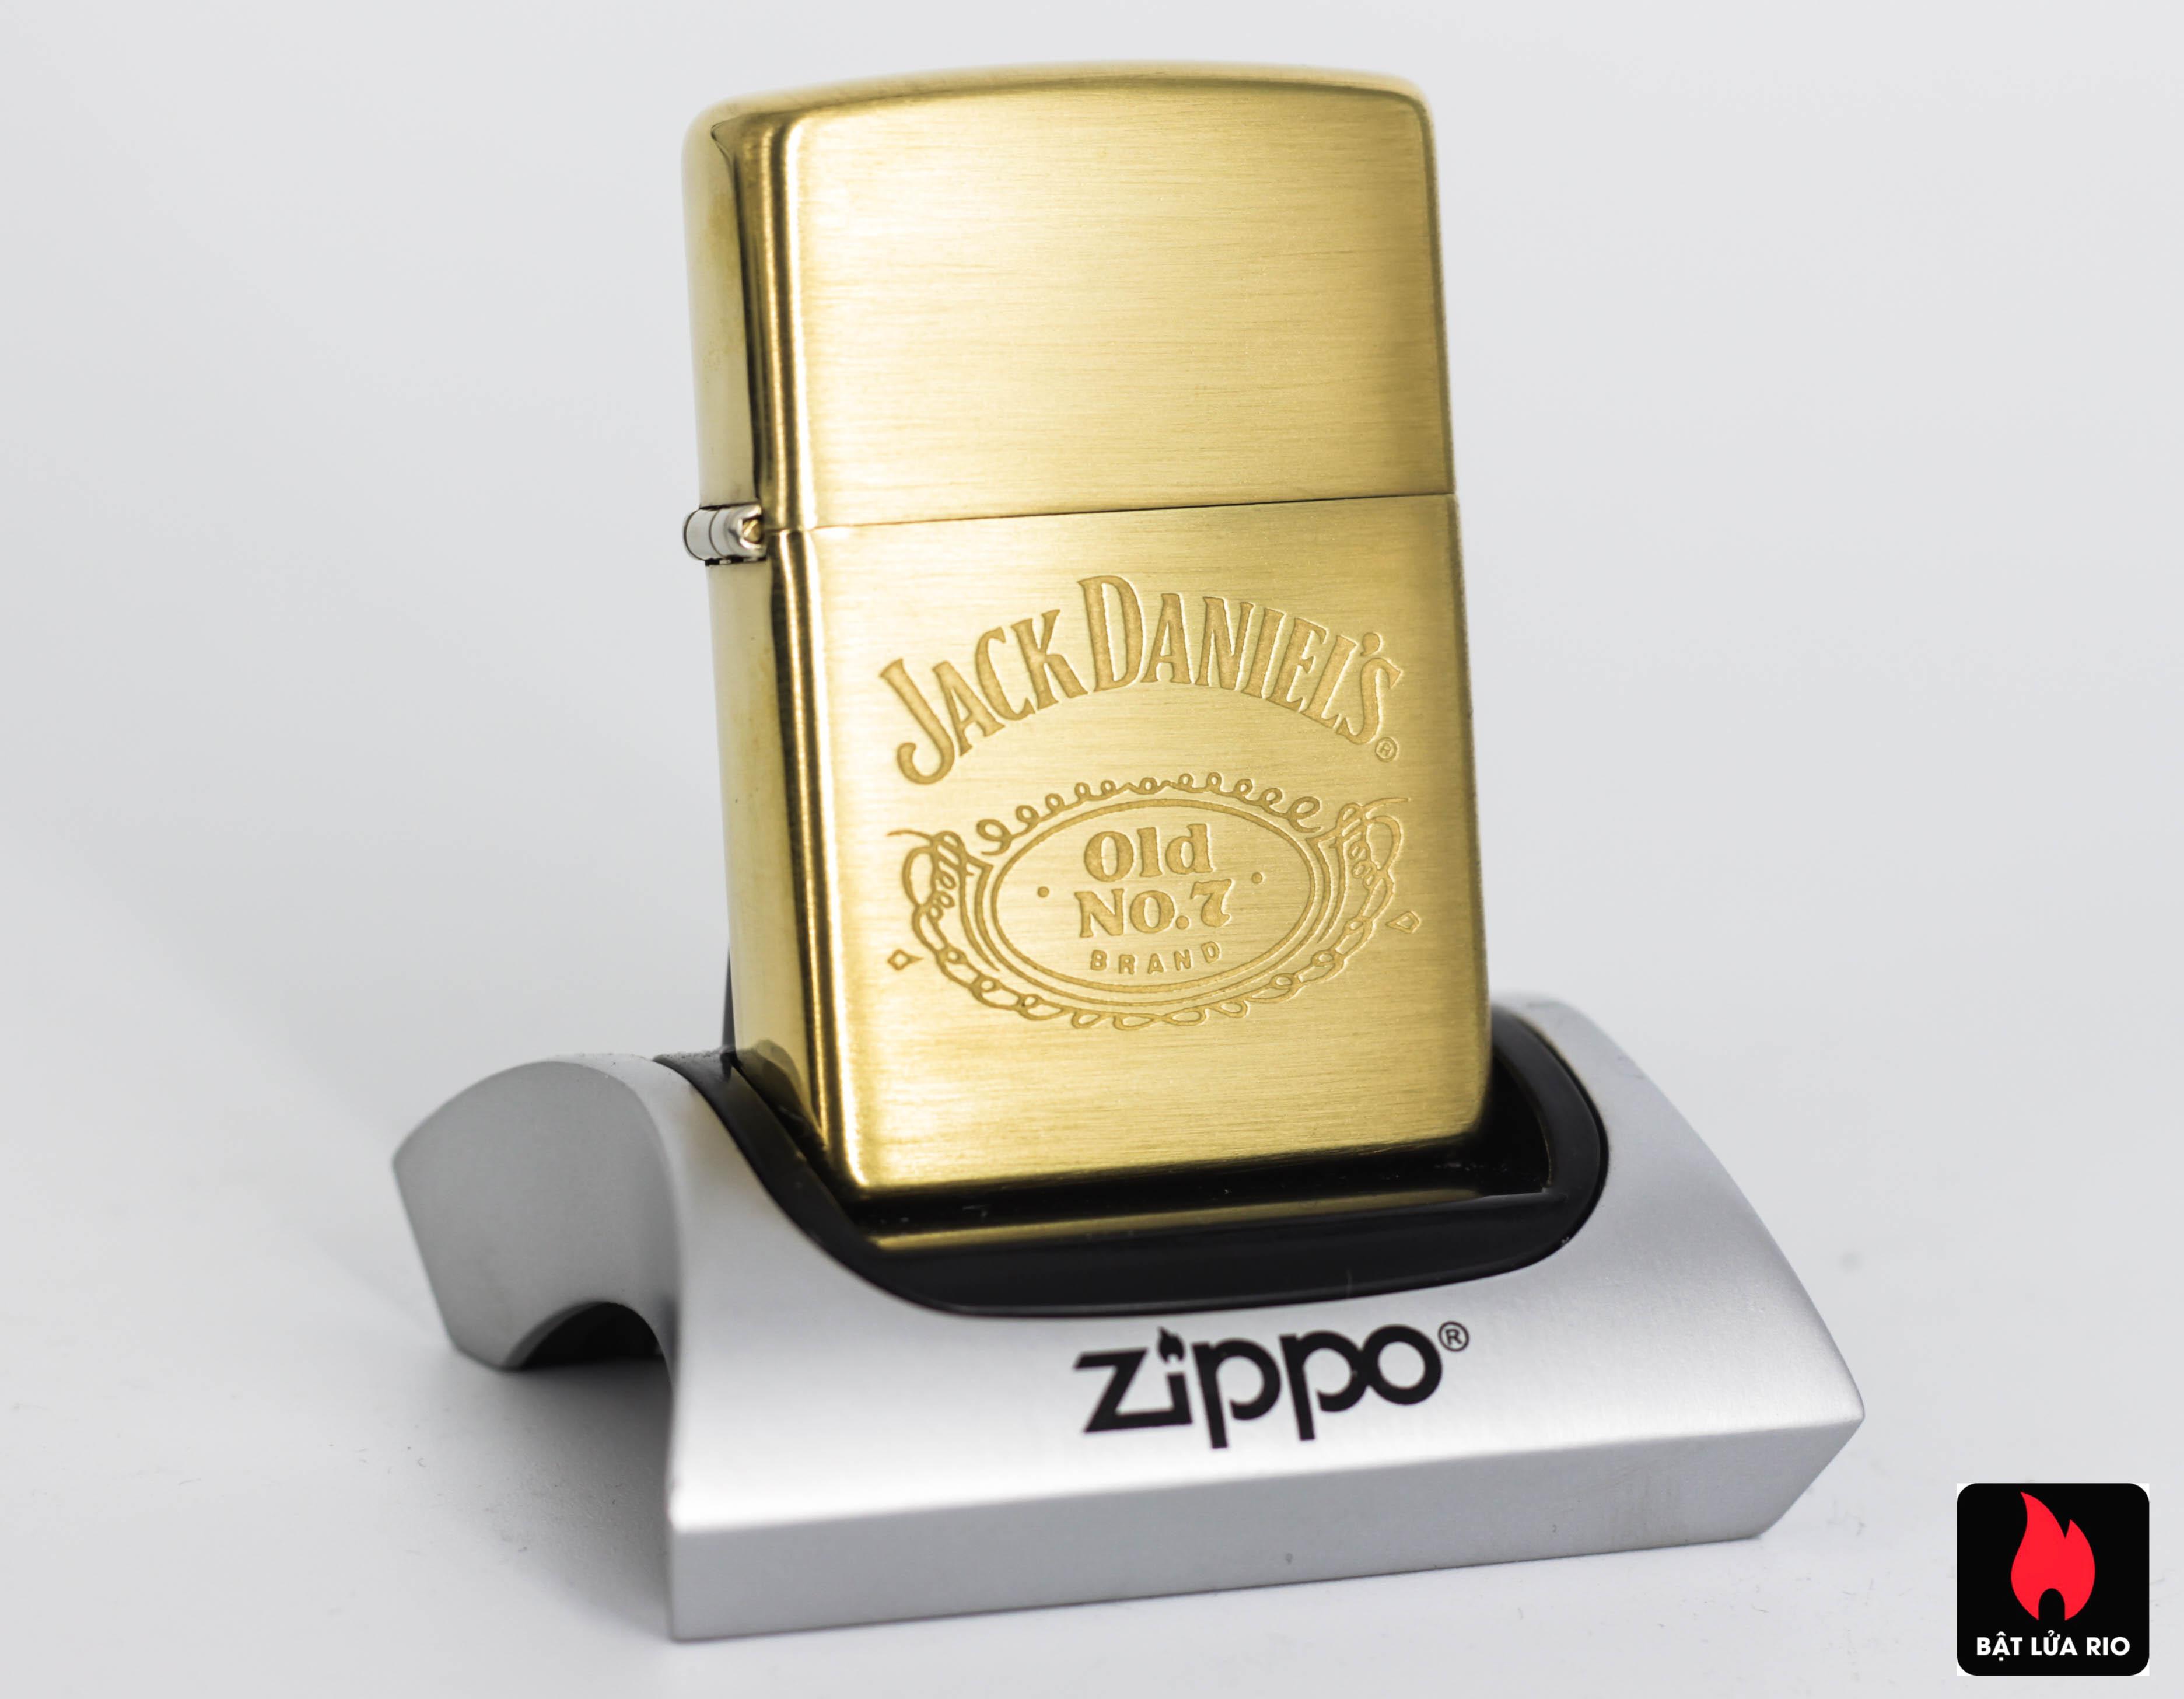 ZIPPO 2001 – JACK DANIEL'S – OLD NO.7